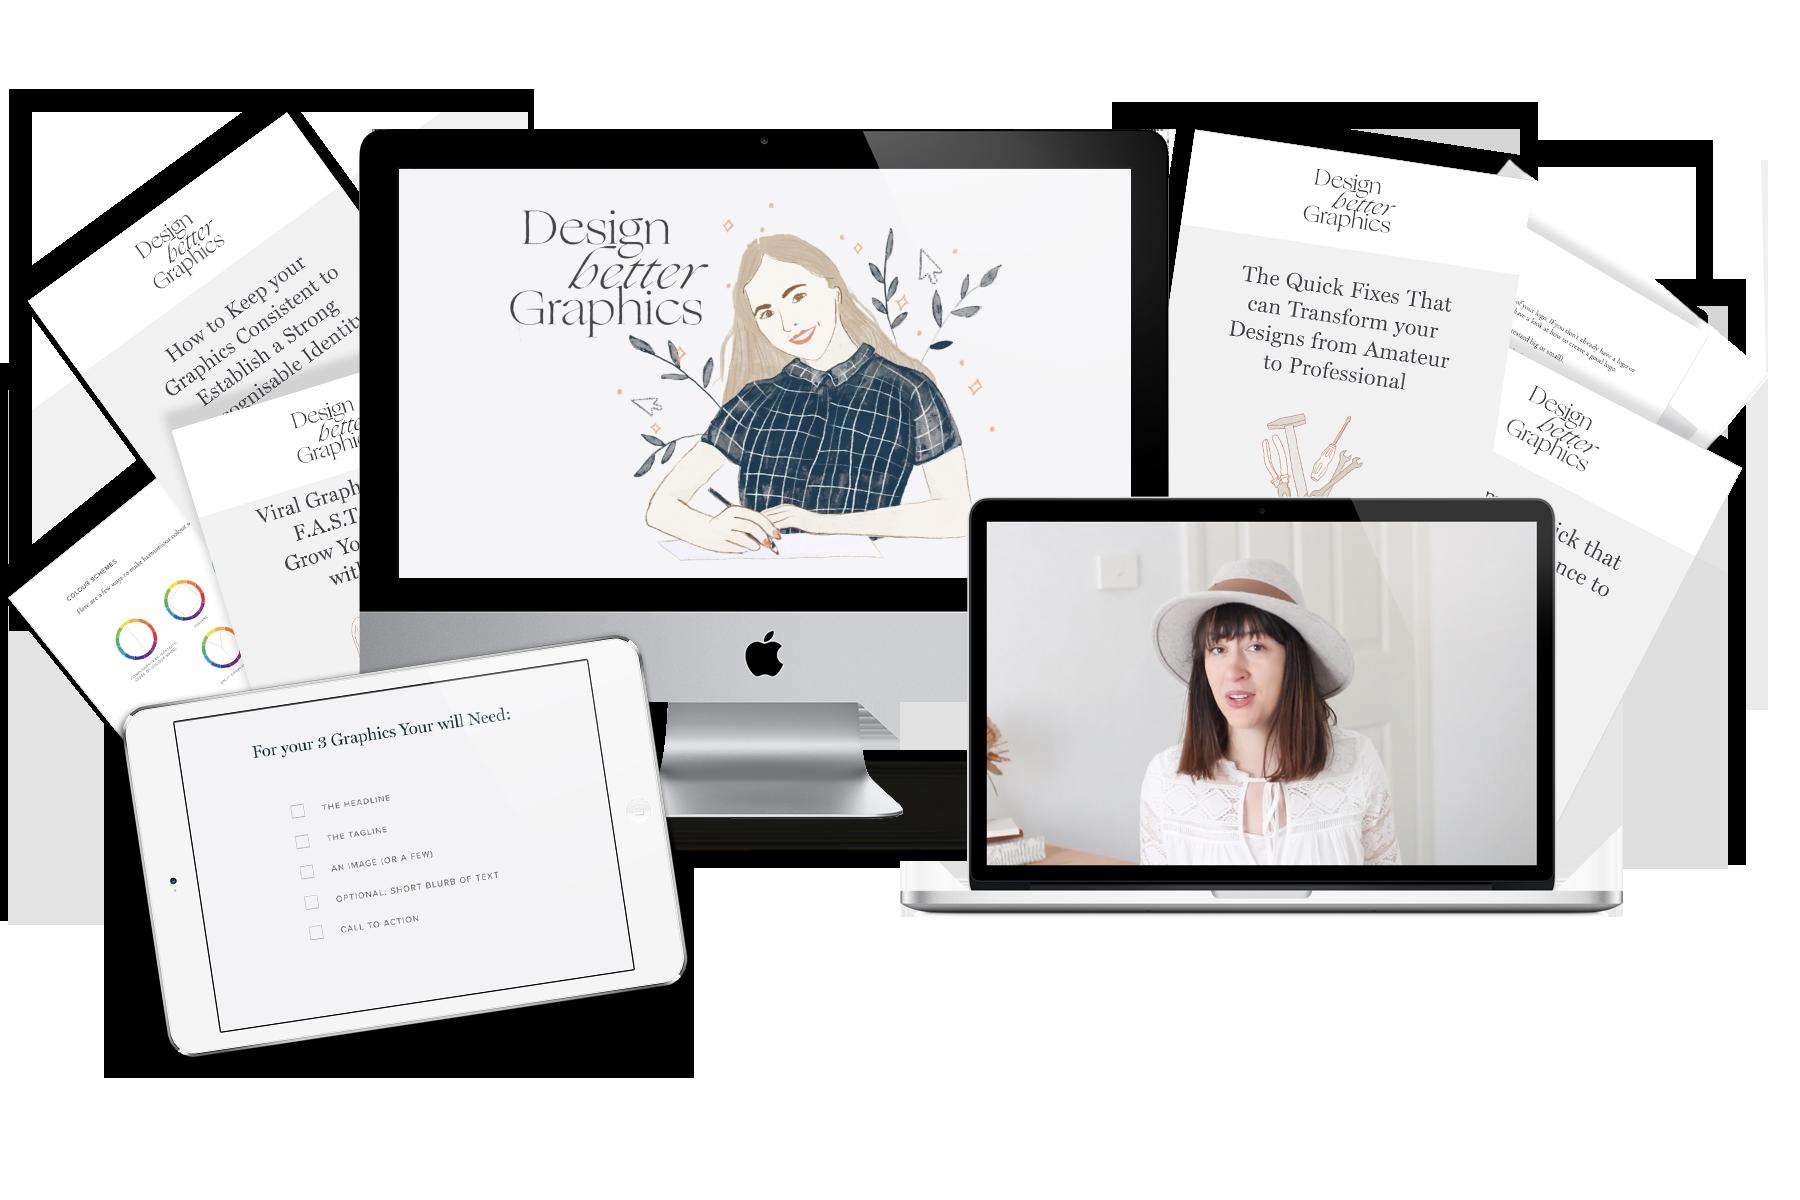 design better graphics graphic design course